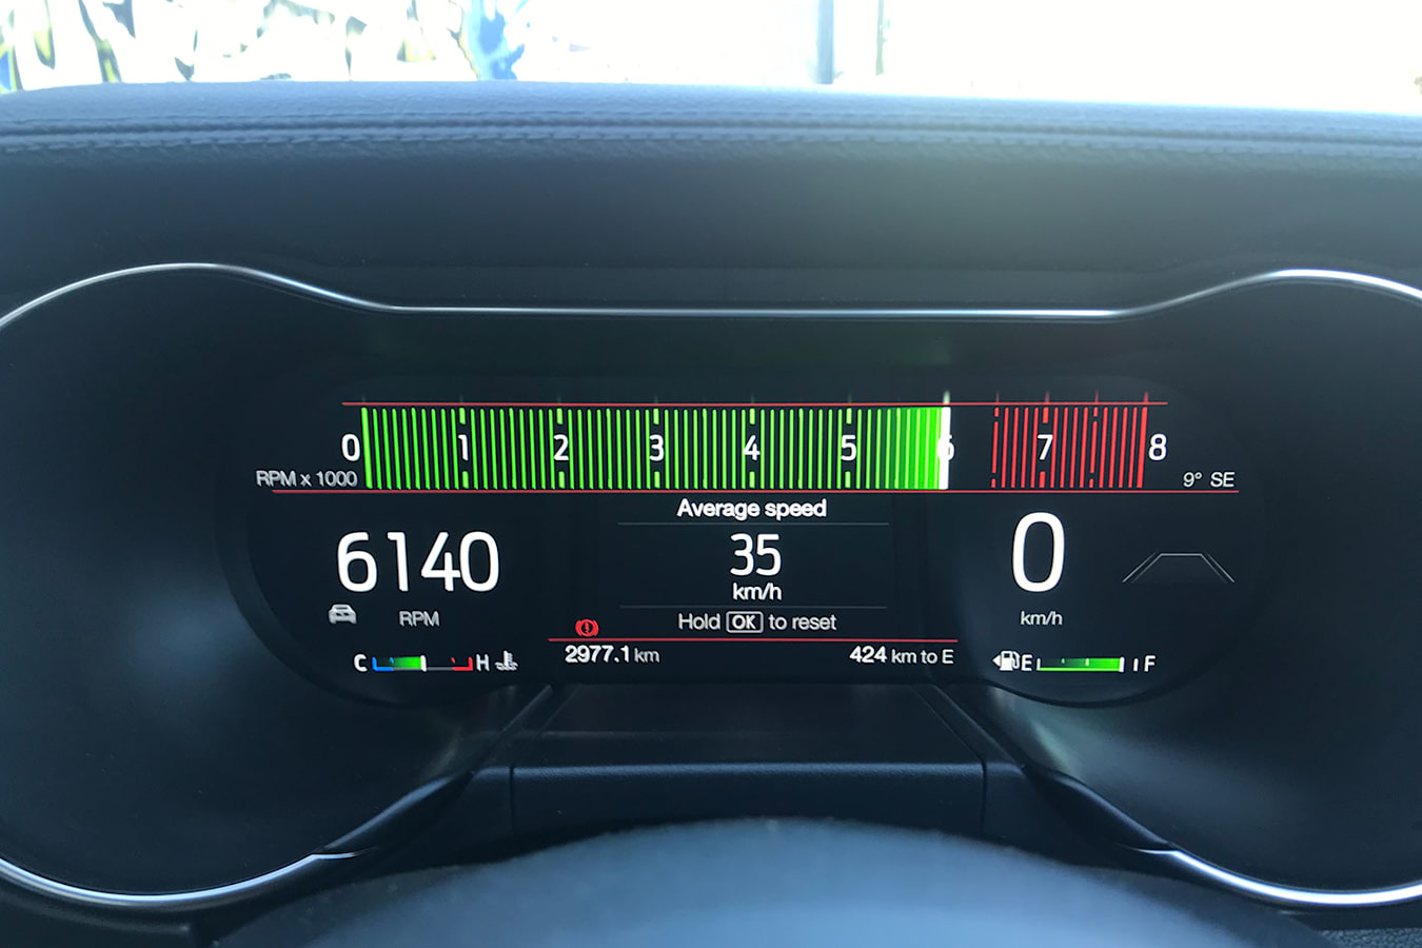 Ford Mustang digital instrument display